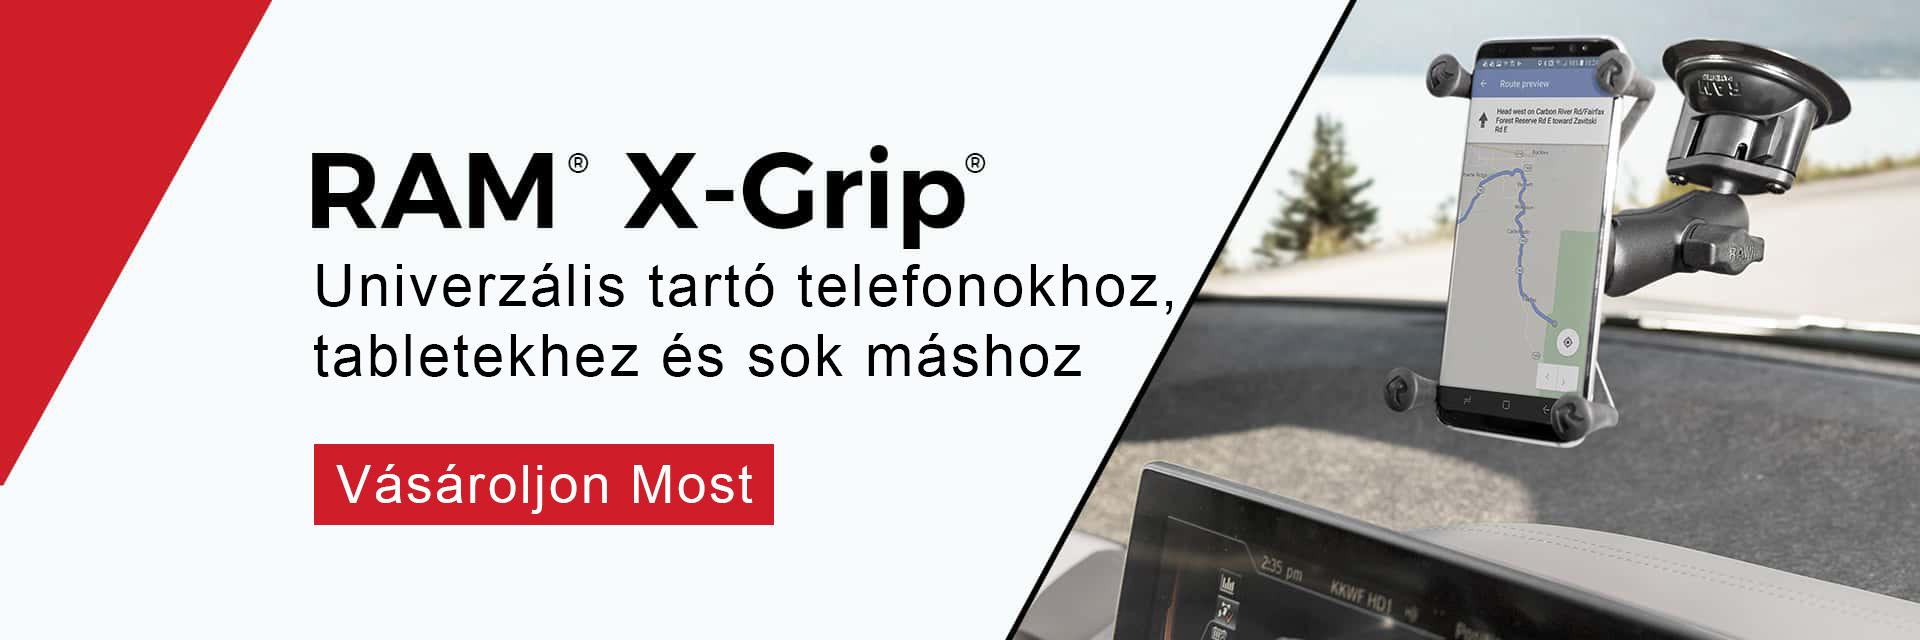 RAM X-Grip